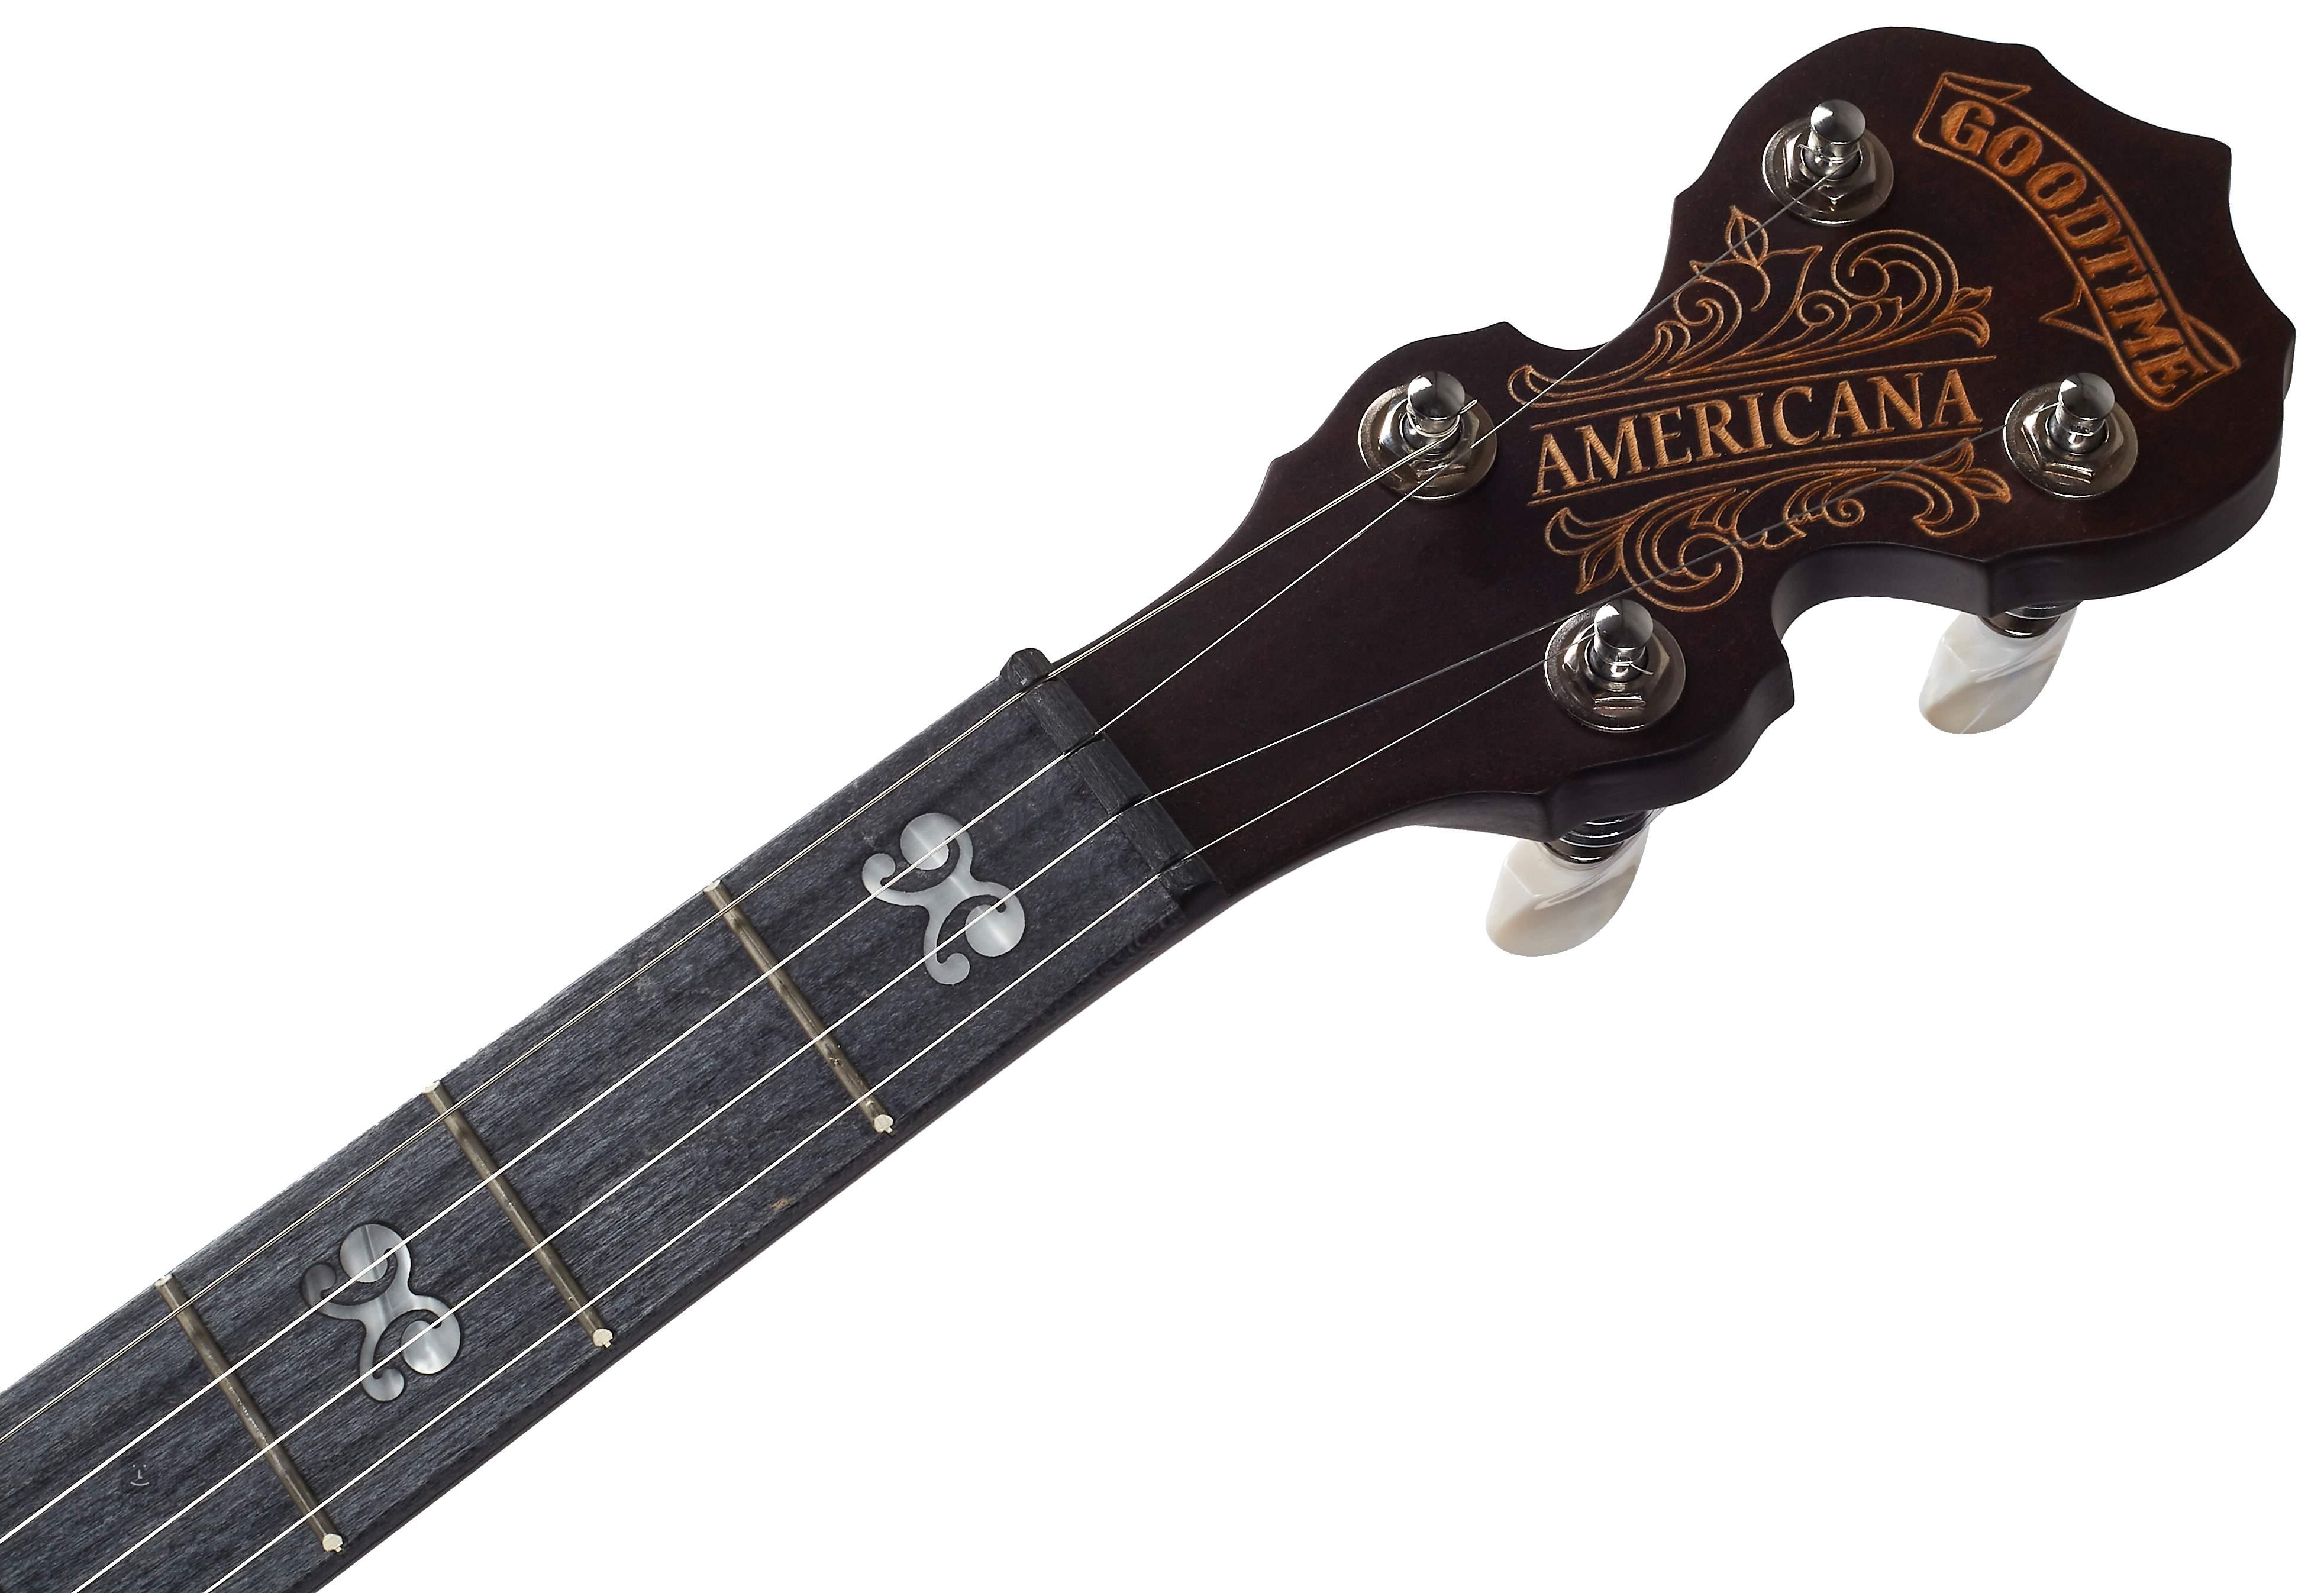 DEERING Artisan Goodtime Americana